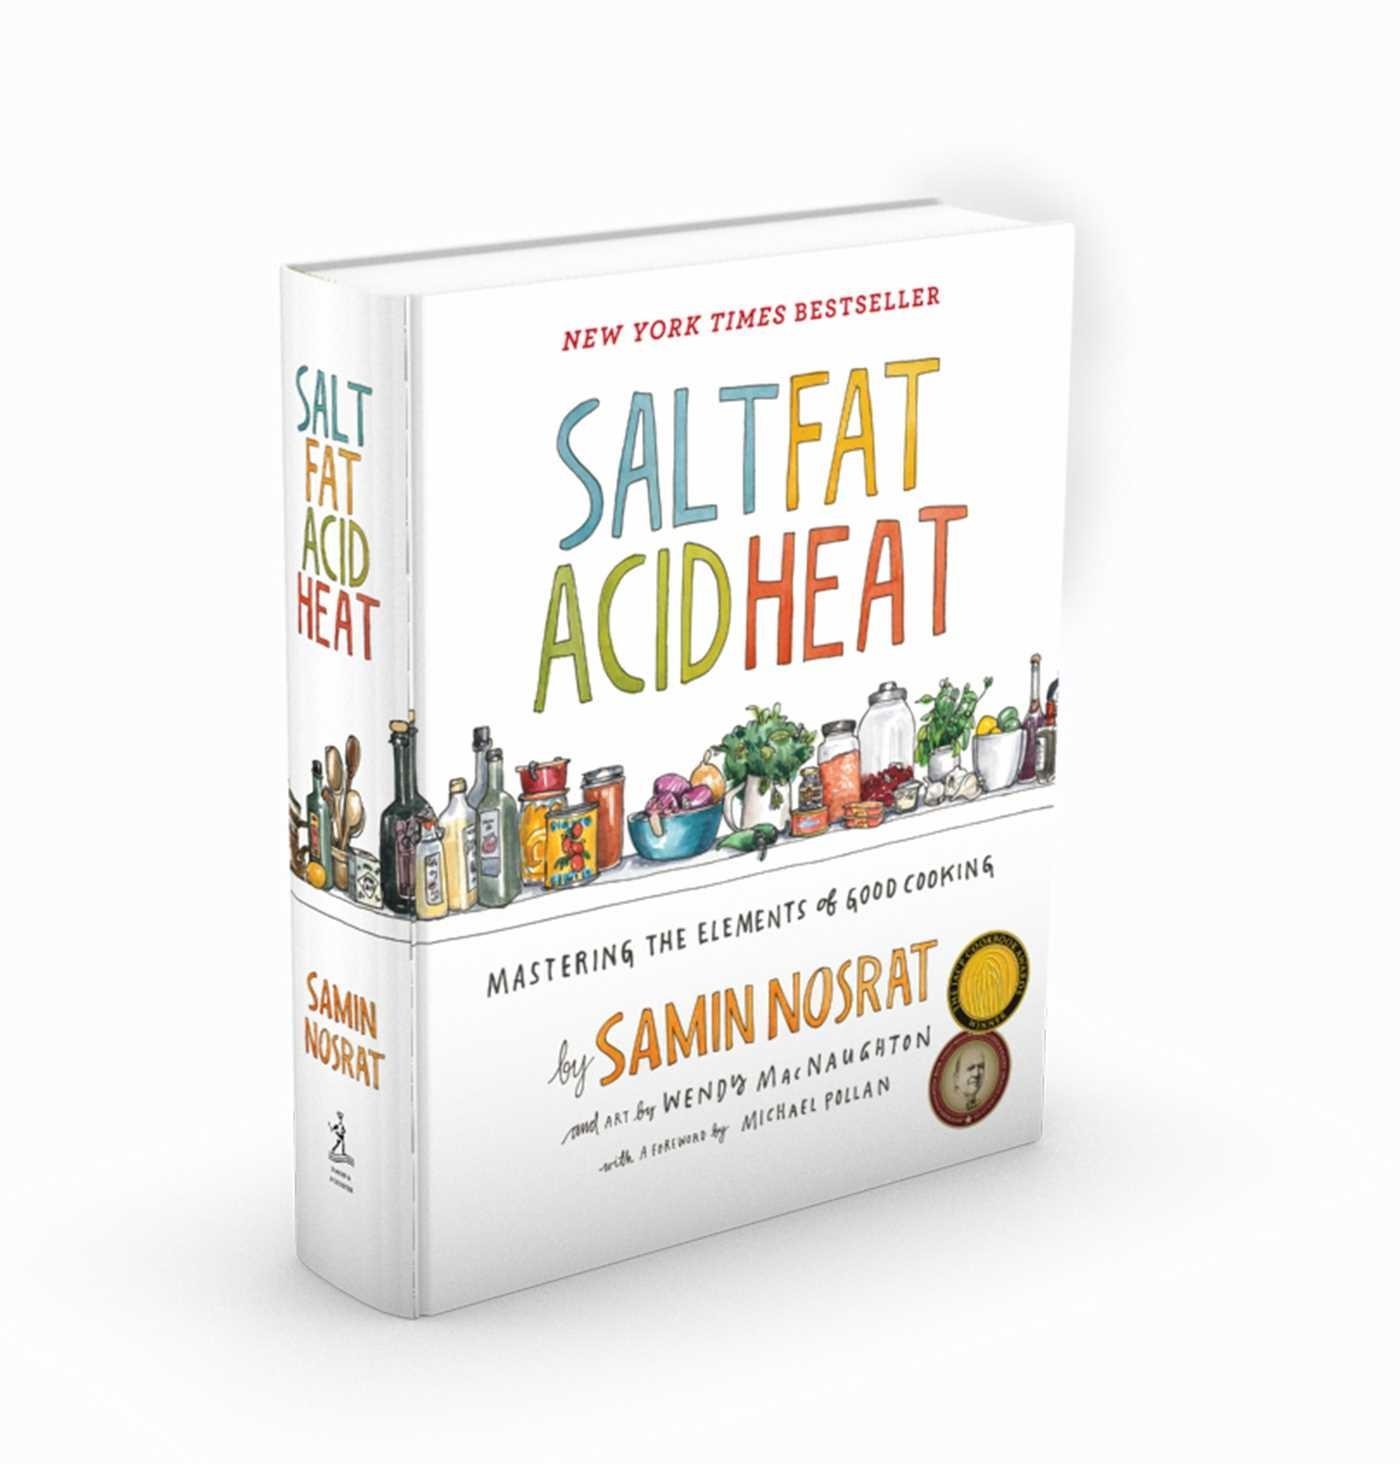 Salt fat acid heat 9781476753836.in17